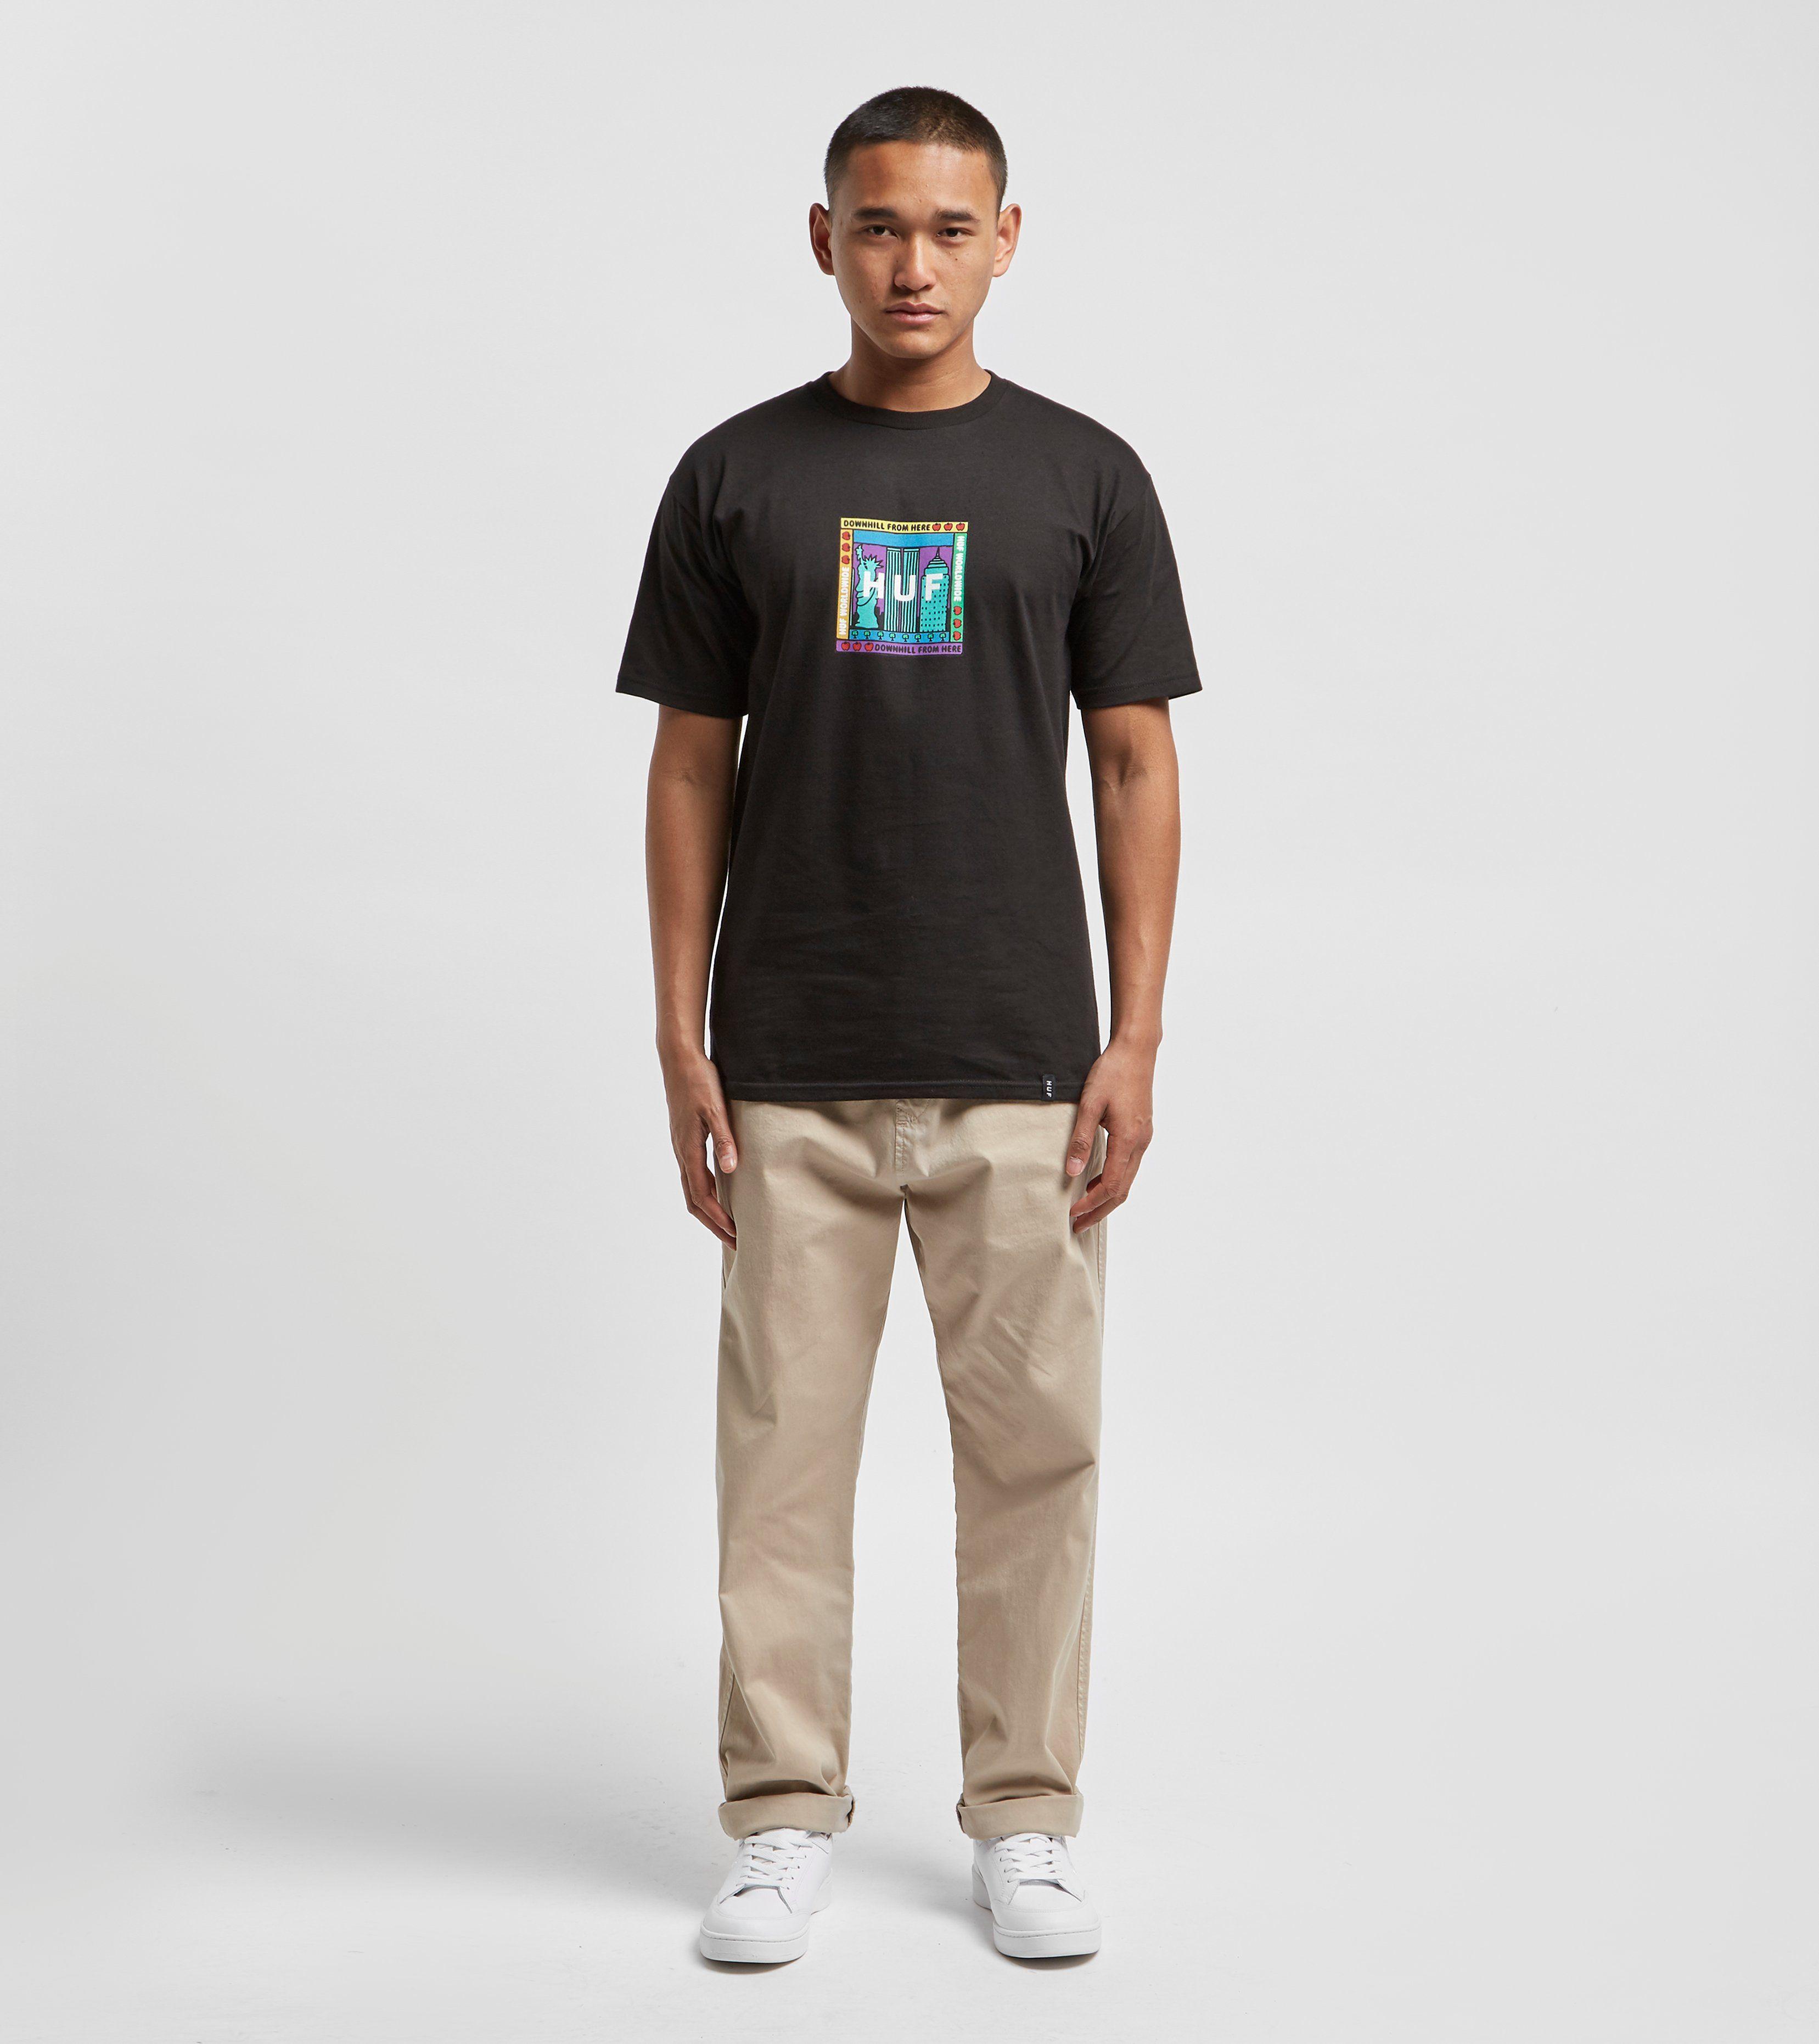 HUF Gift Shop T-Shirt